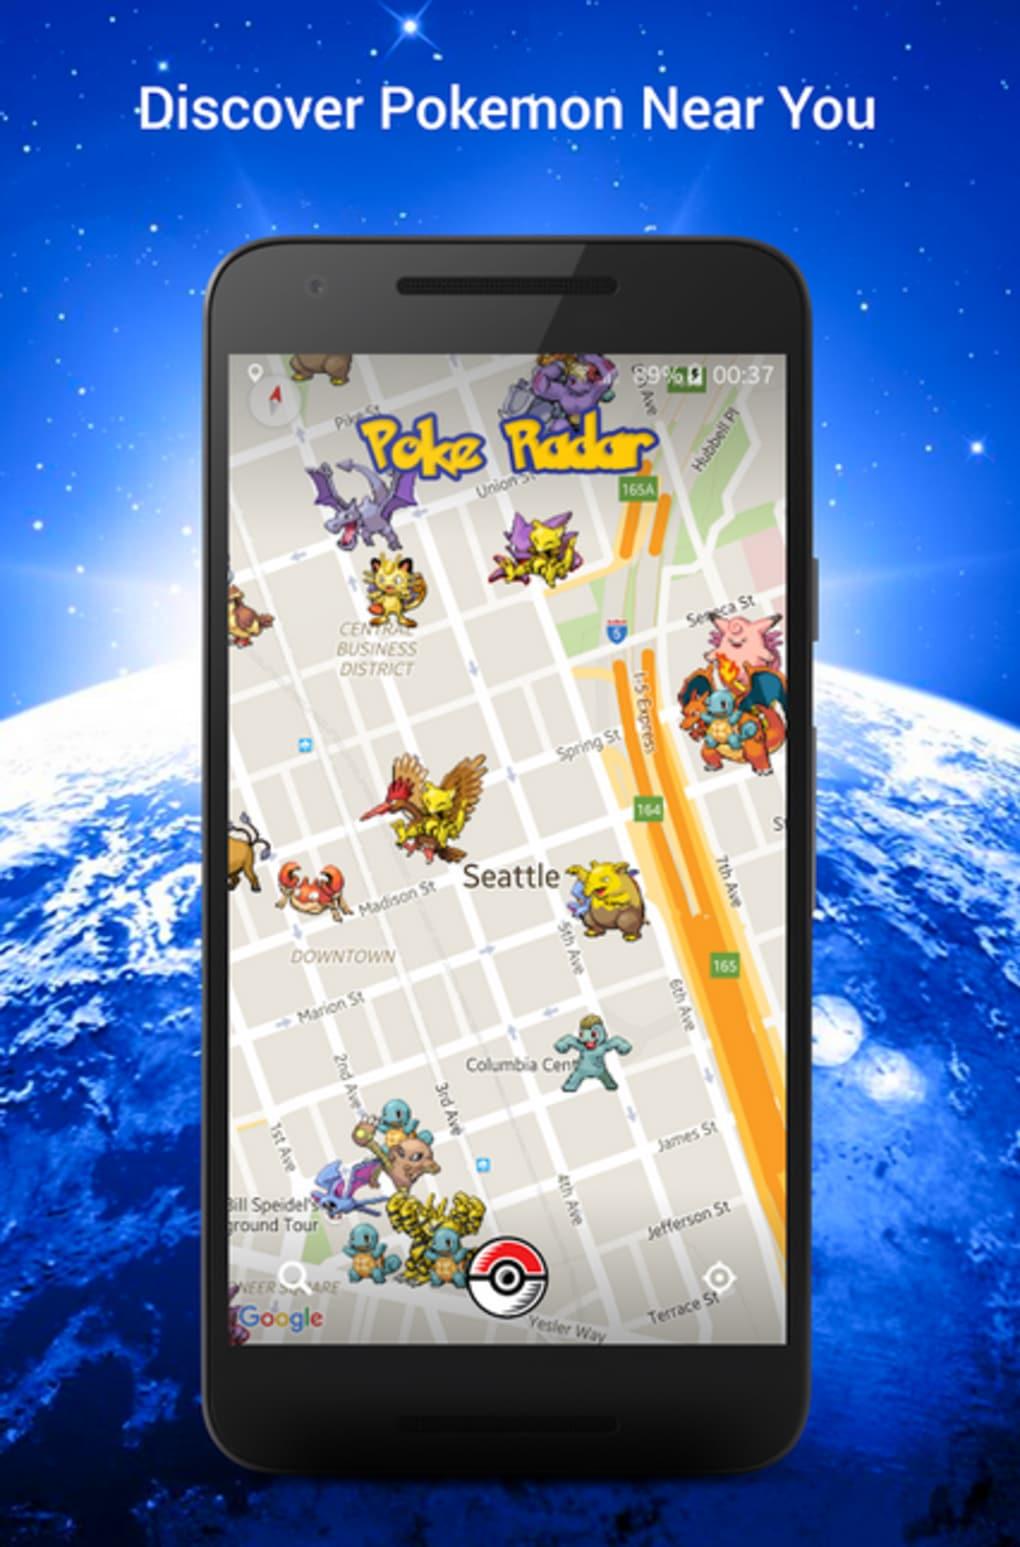 Poke Radar for Pokemon GO for Android - Download